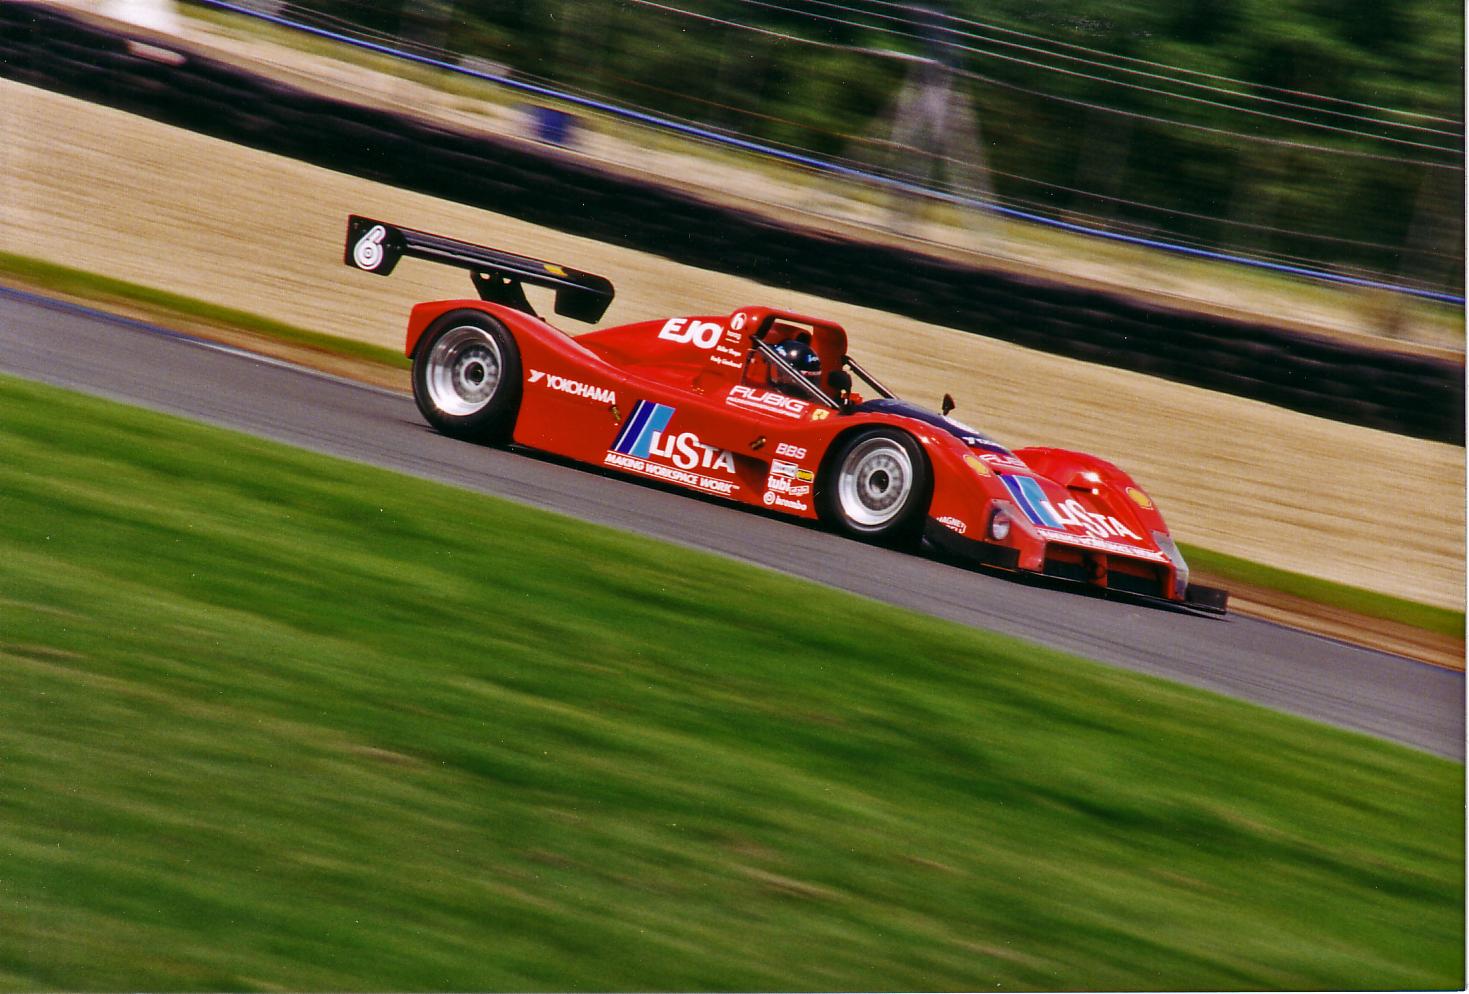 Filehorag Hotz Ferrari 333 Spjpg Wikimedia Commons